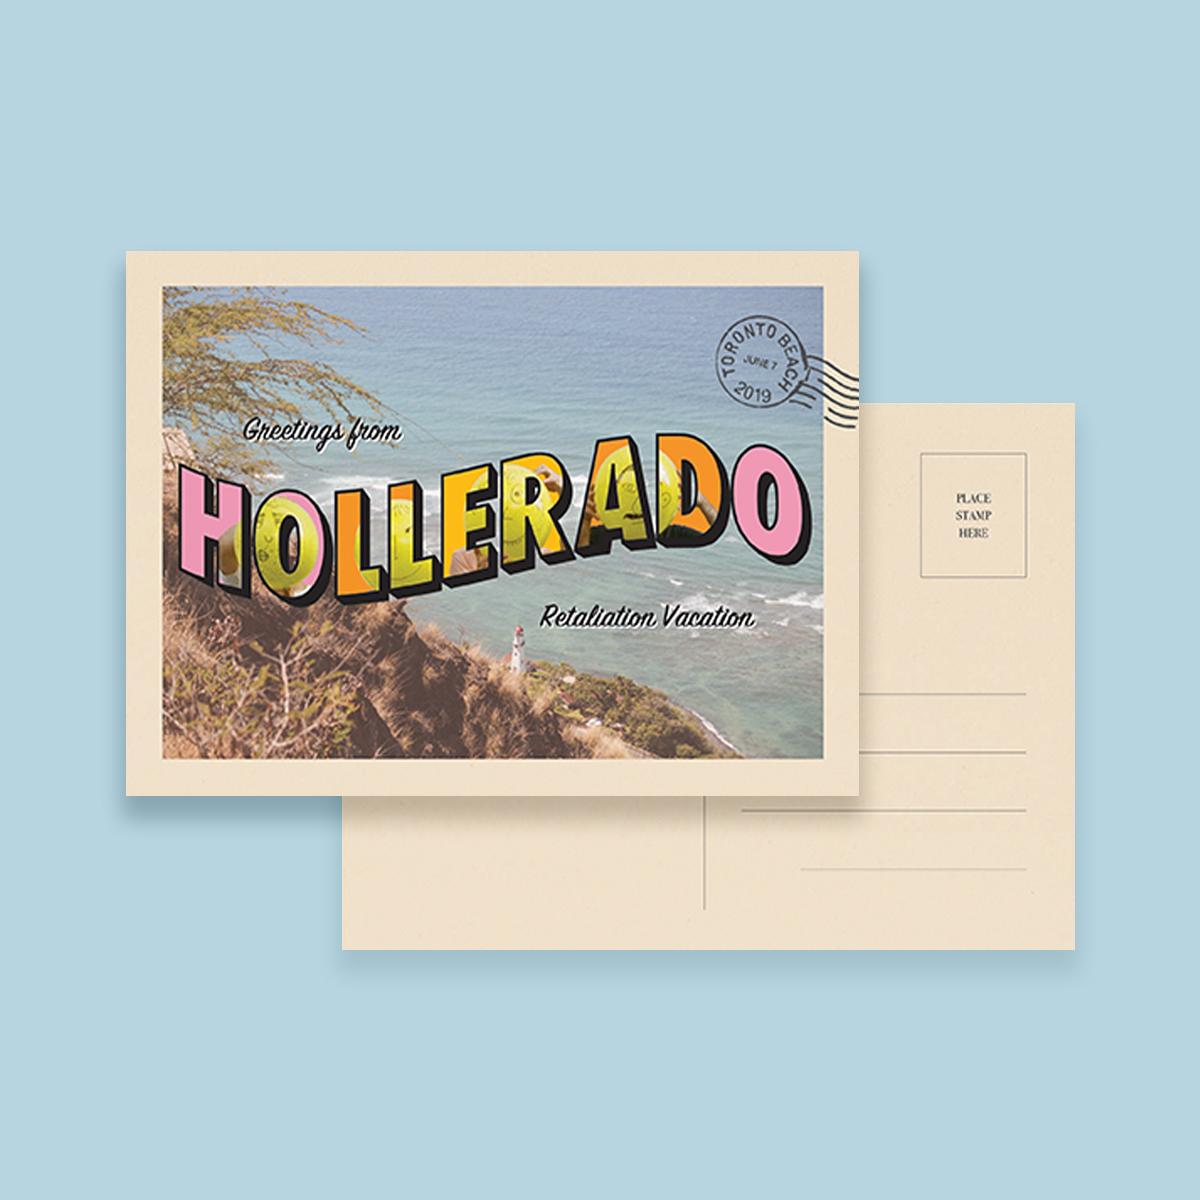 HolleradoPostcard.jpg